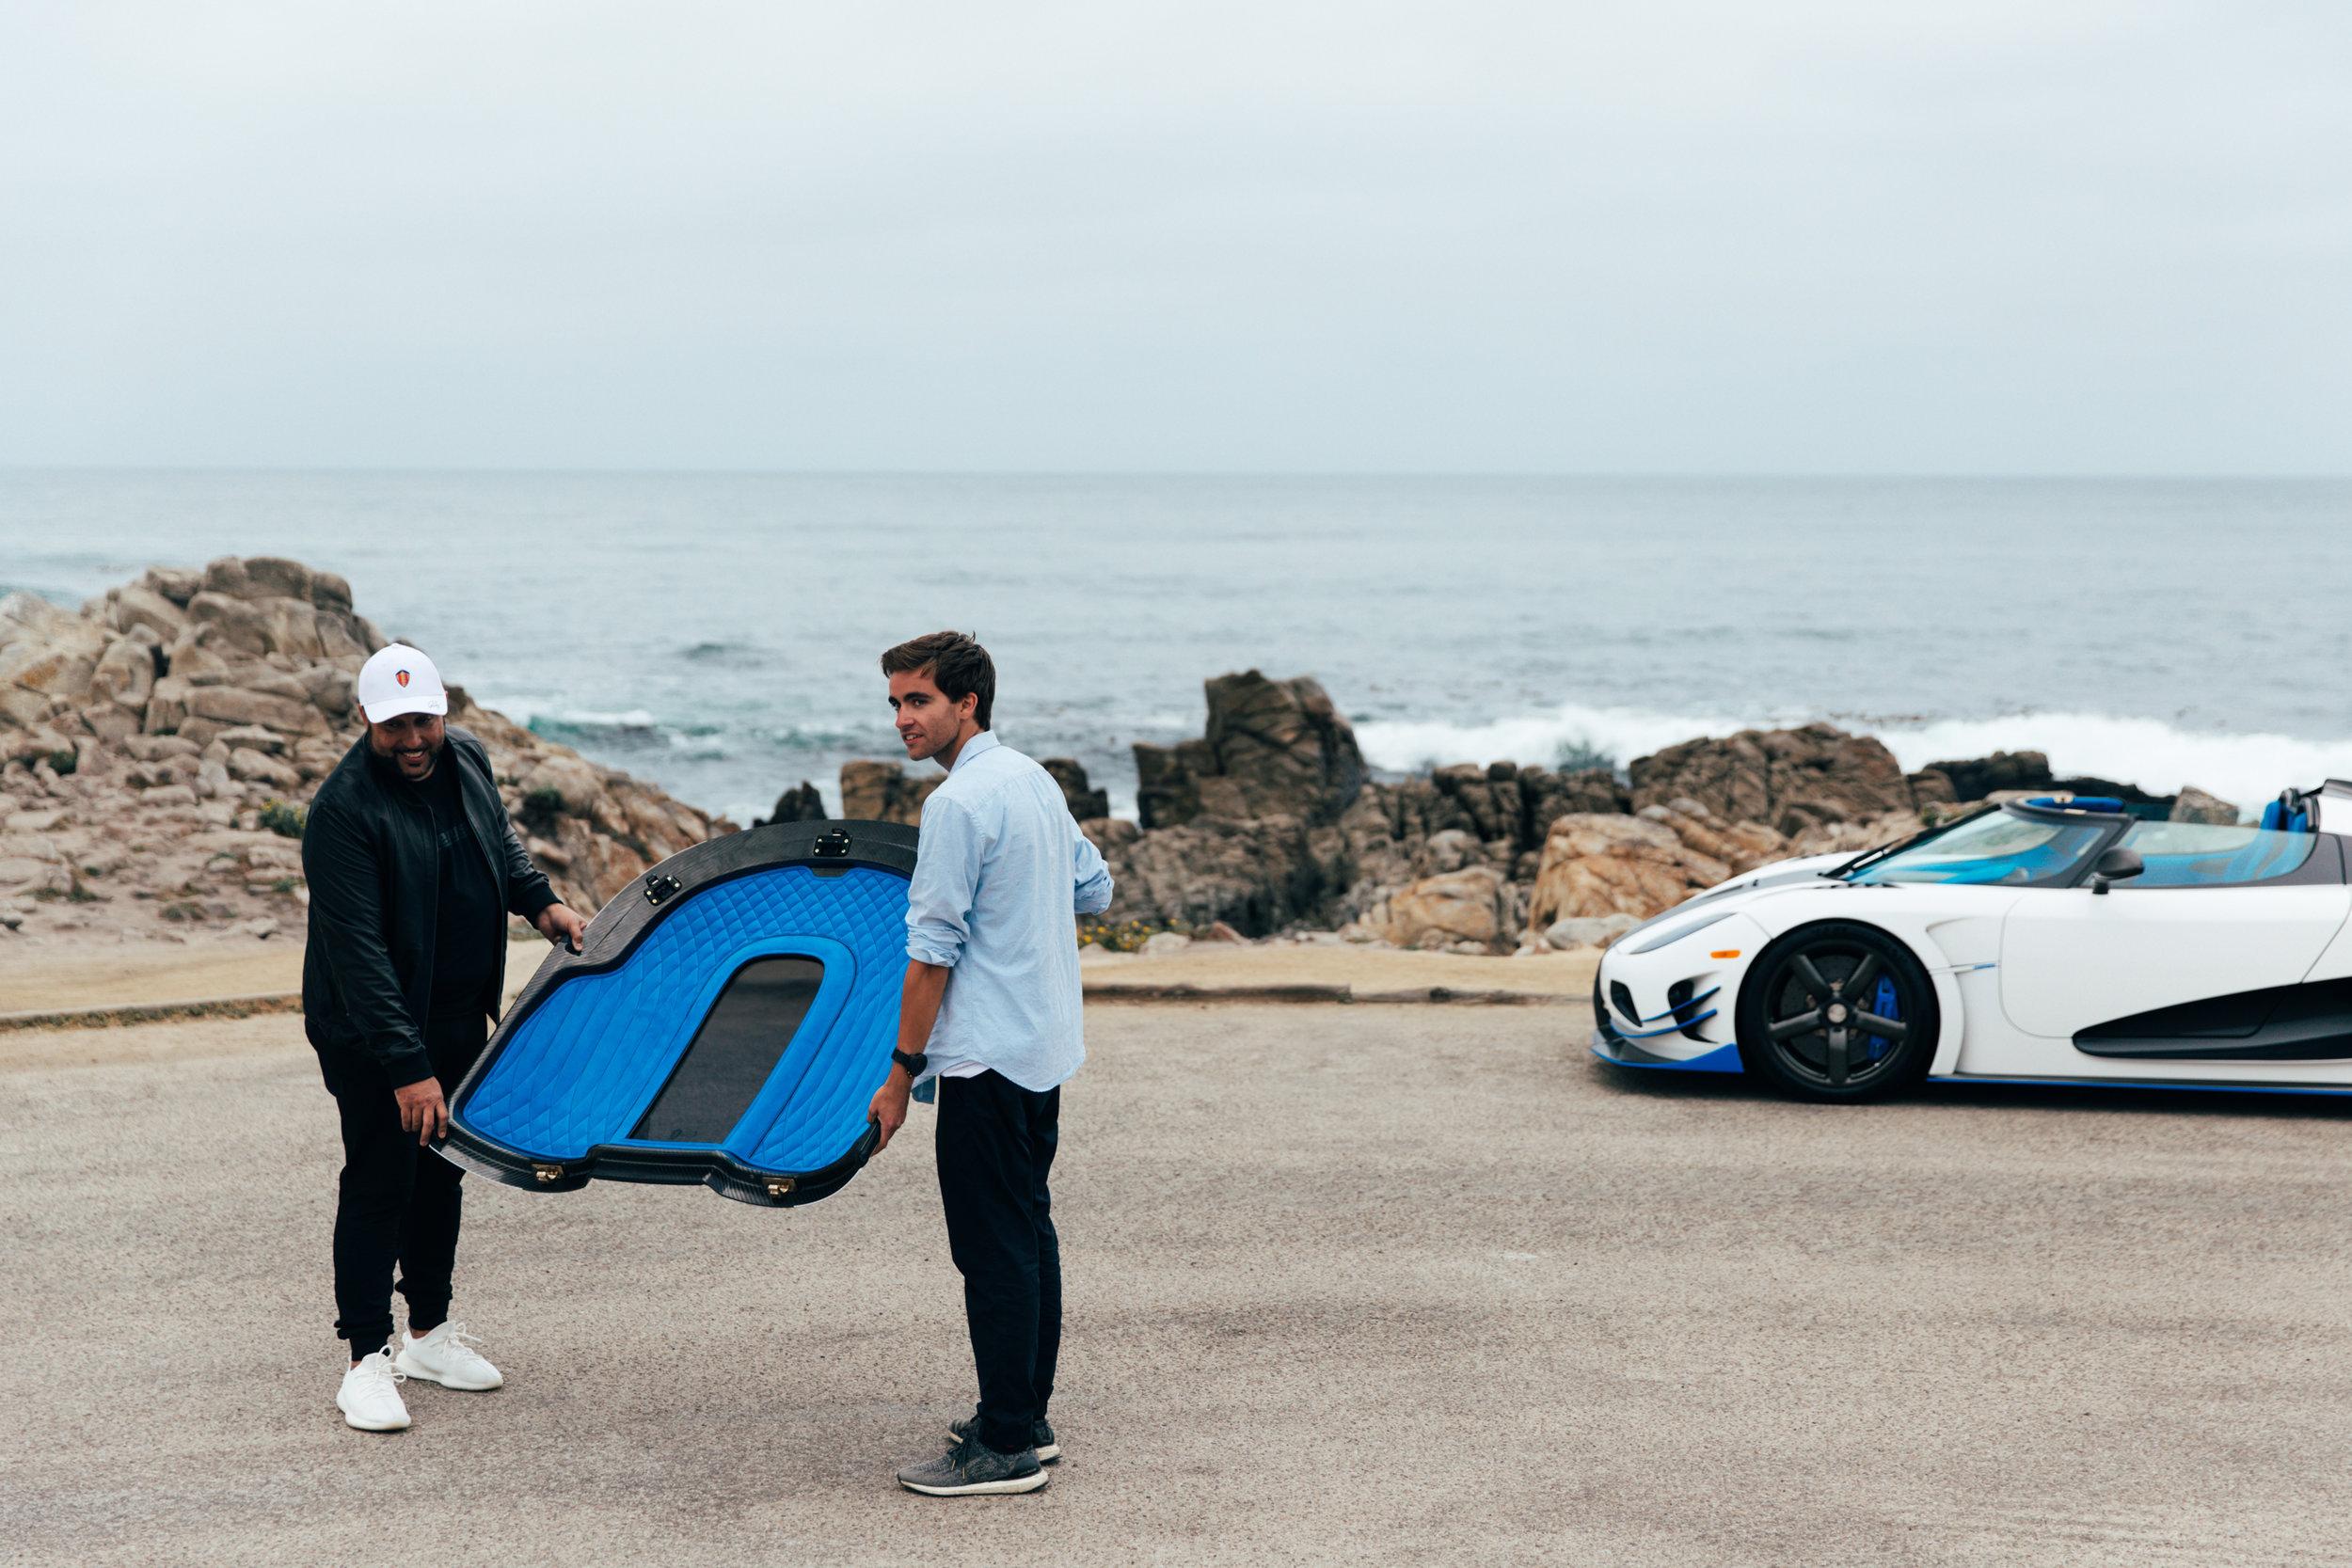 Stay_Driven_Monterey_Car_Week_Whitesse_Koenigsegg-22.jpg